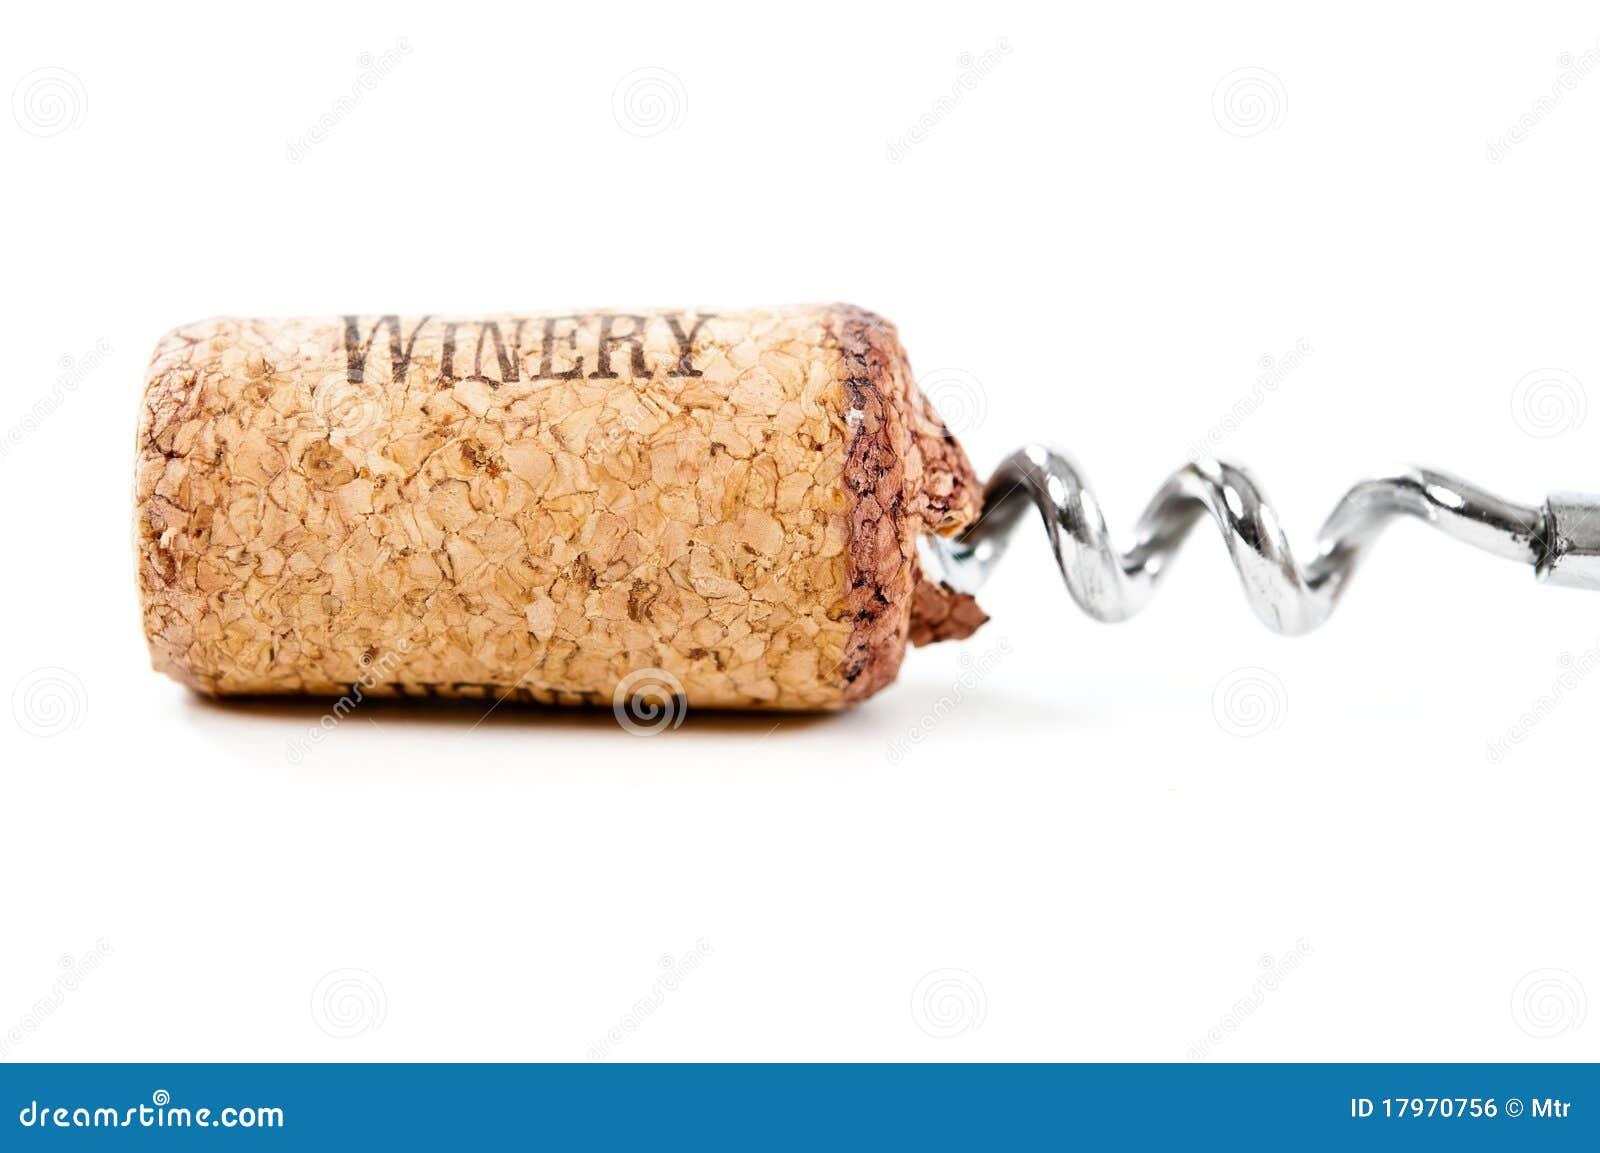 Close up of cork